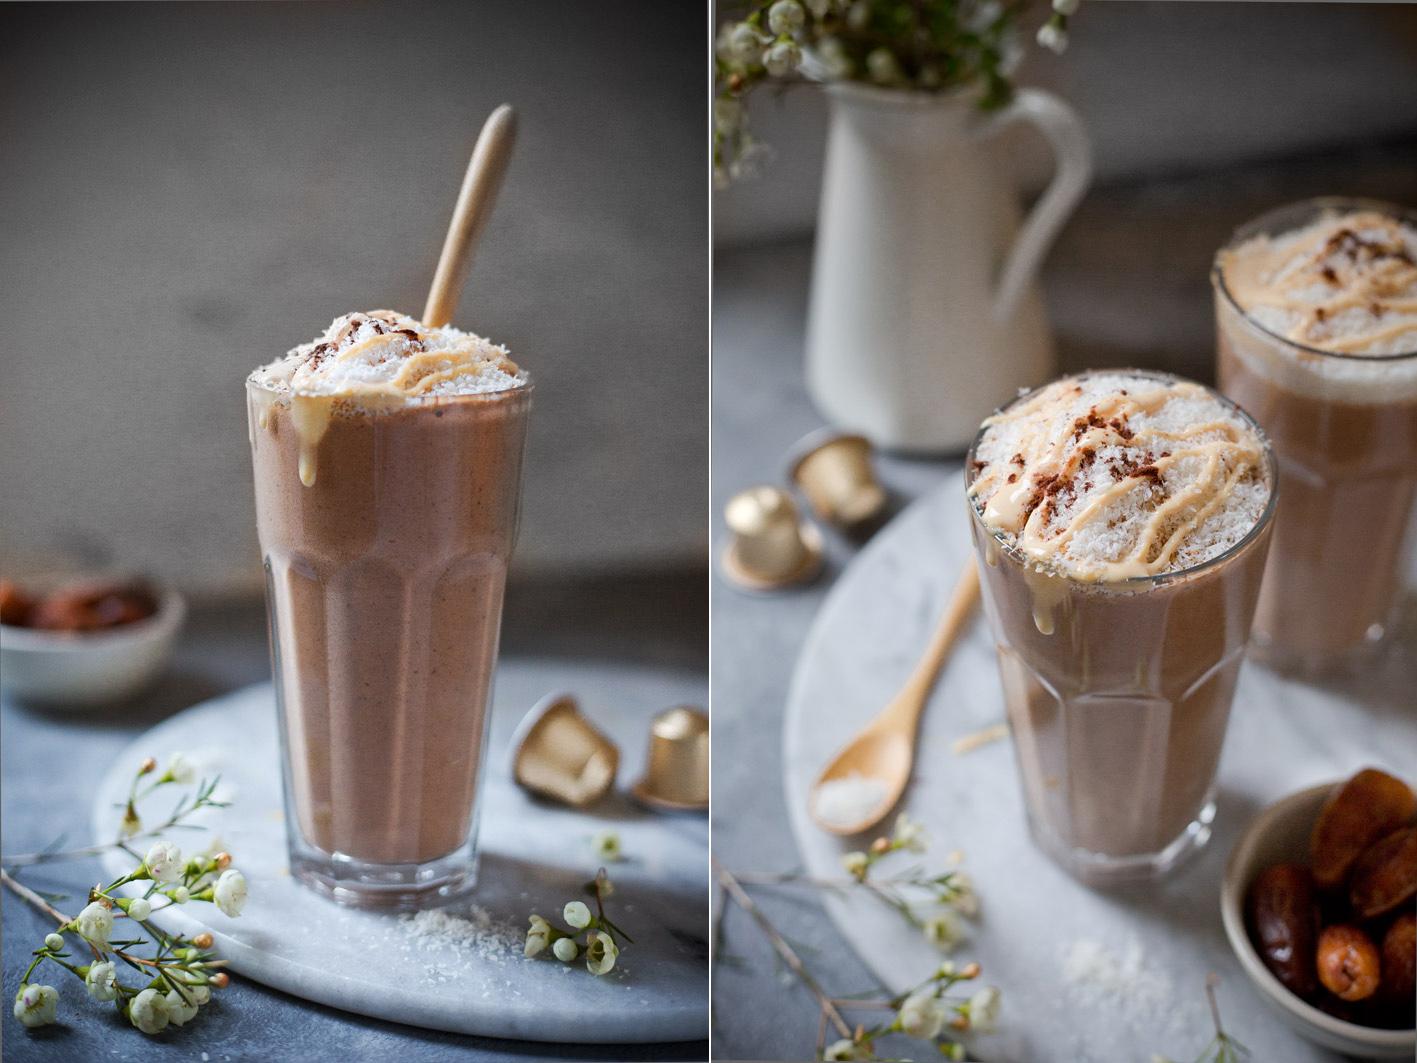 Schoko-Kaffee-Smoothie